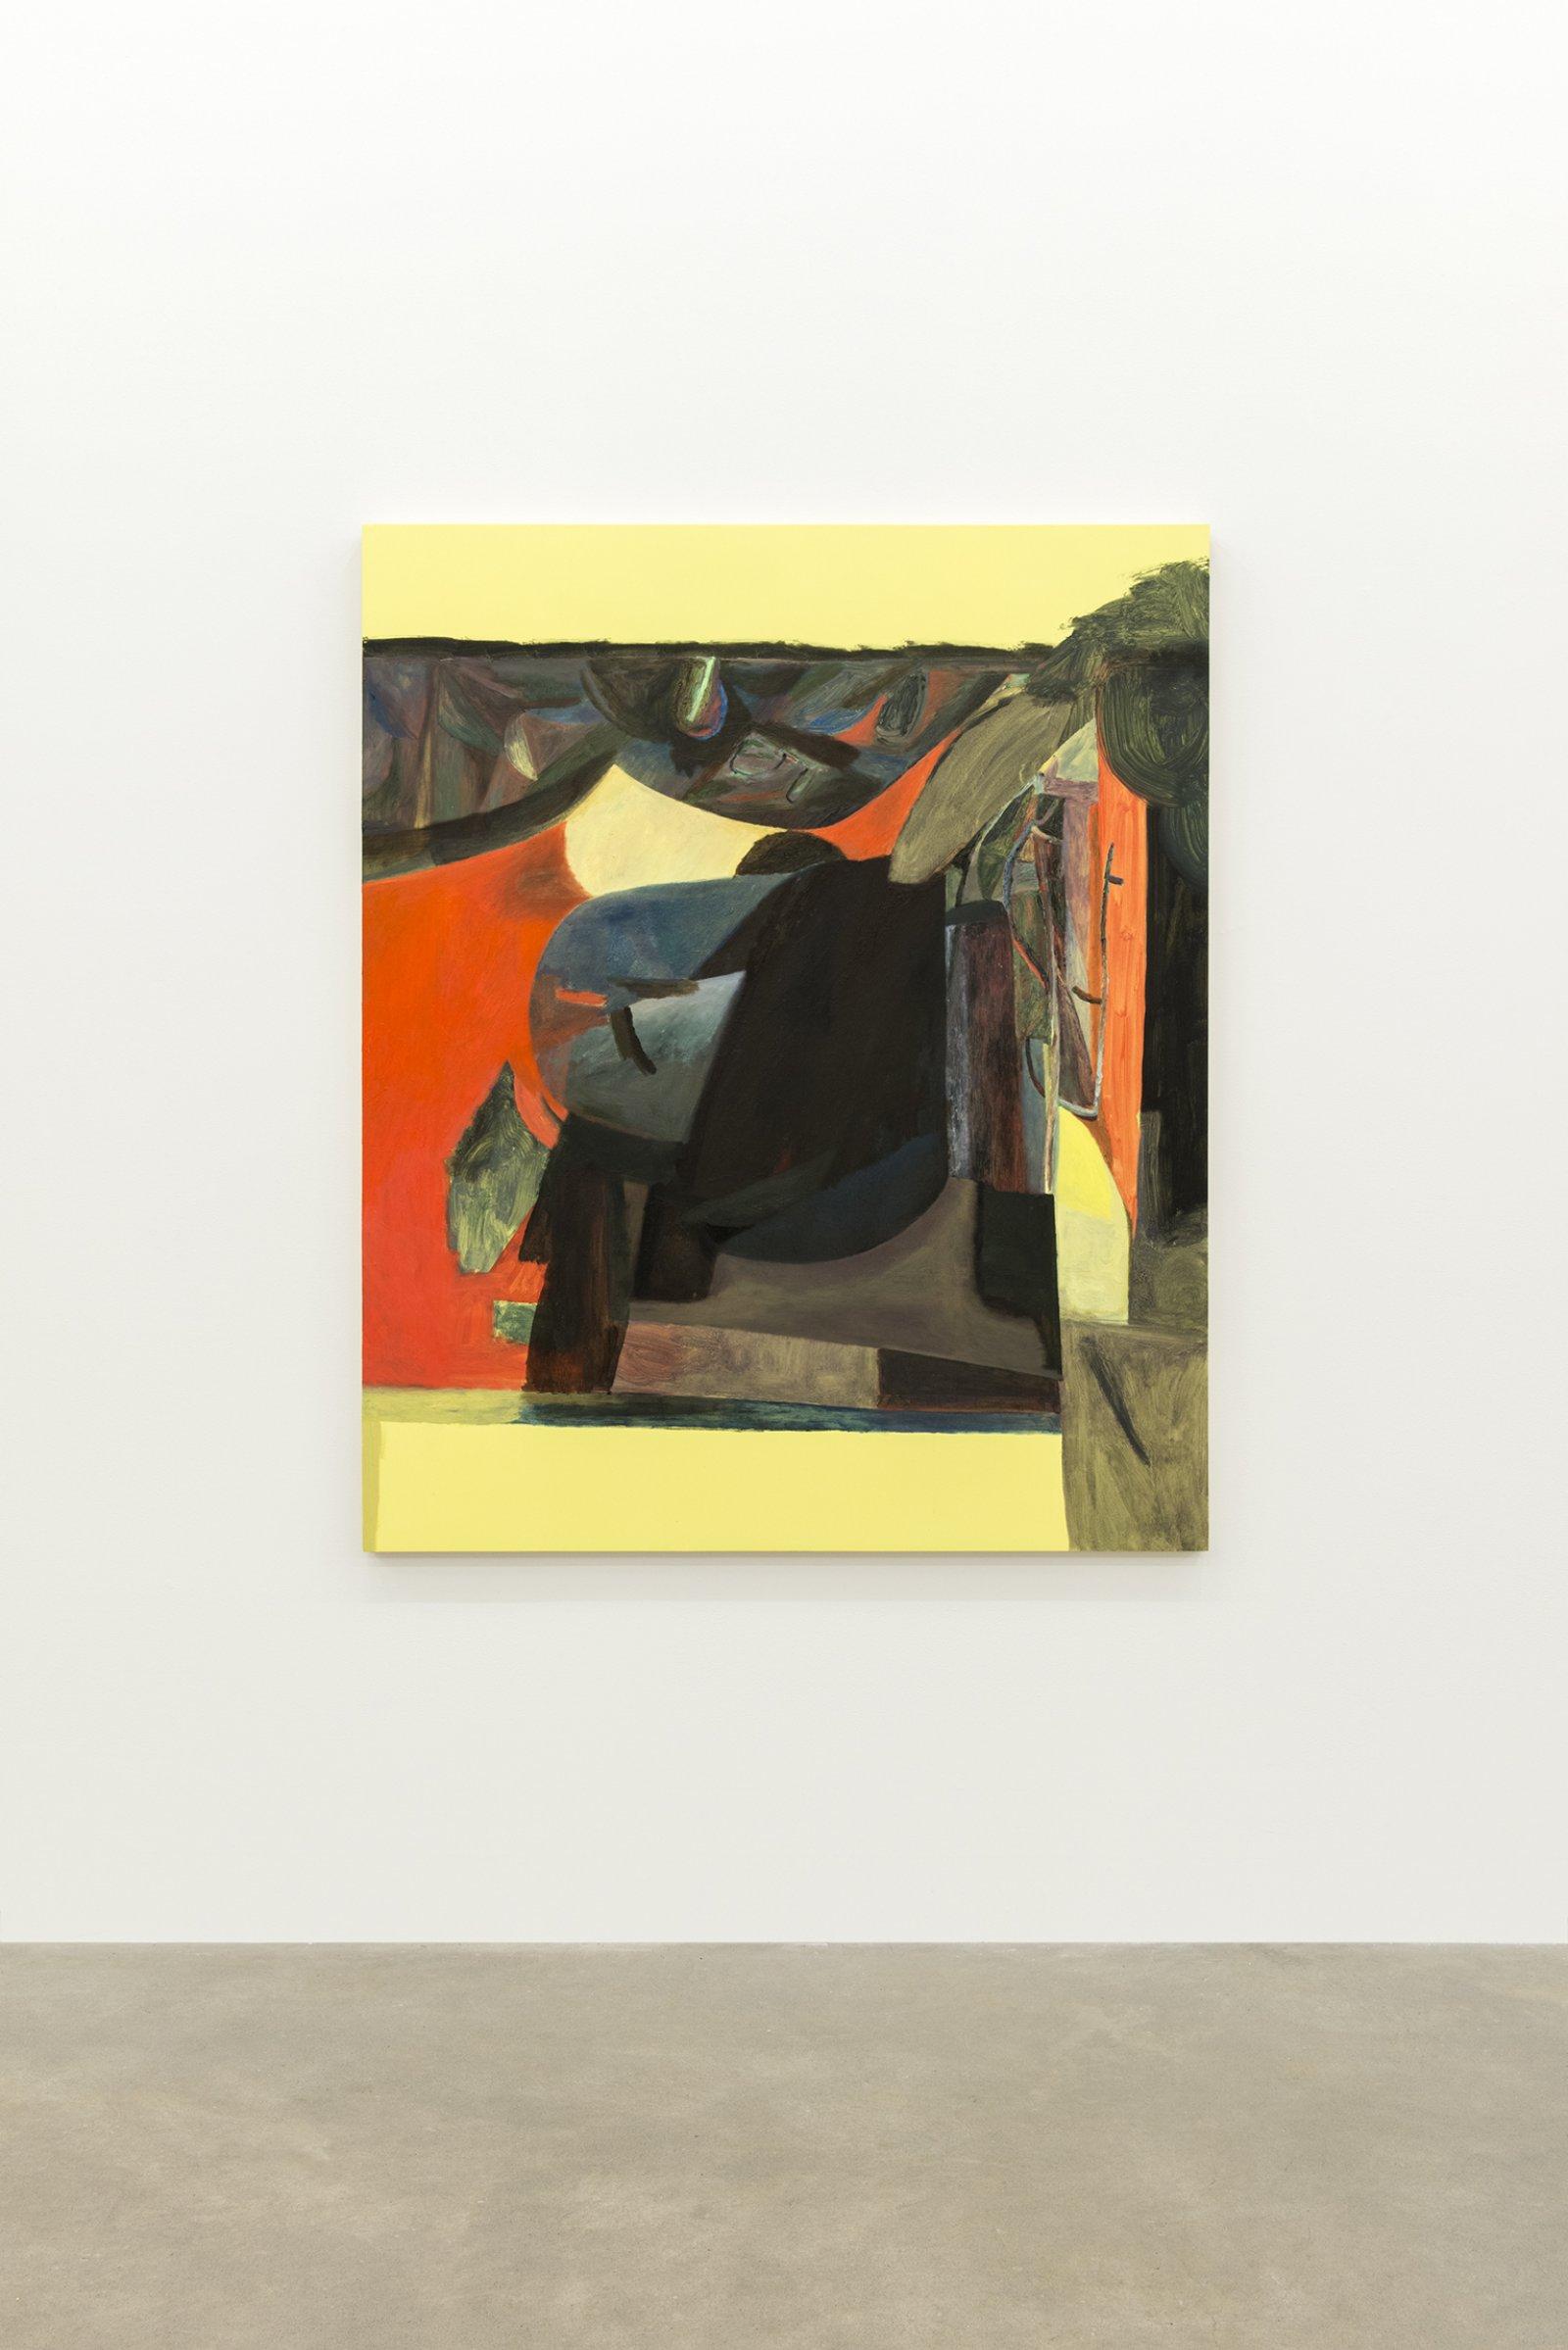 Rebecca Brewer, The Beatnik, 2013, oil on panel, 57 x 47 in. (145 x 47 cm) by Rebecca Brewer